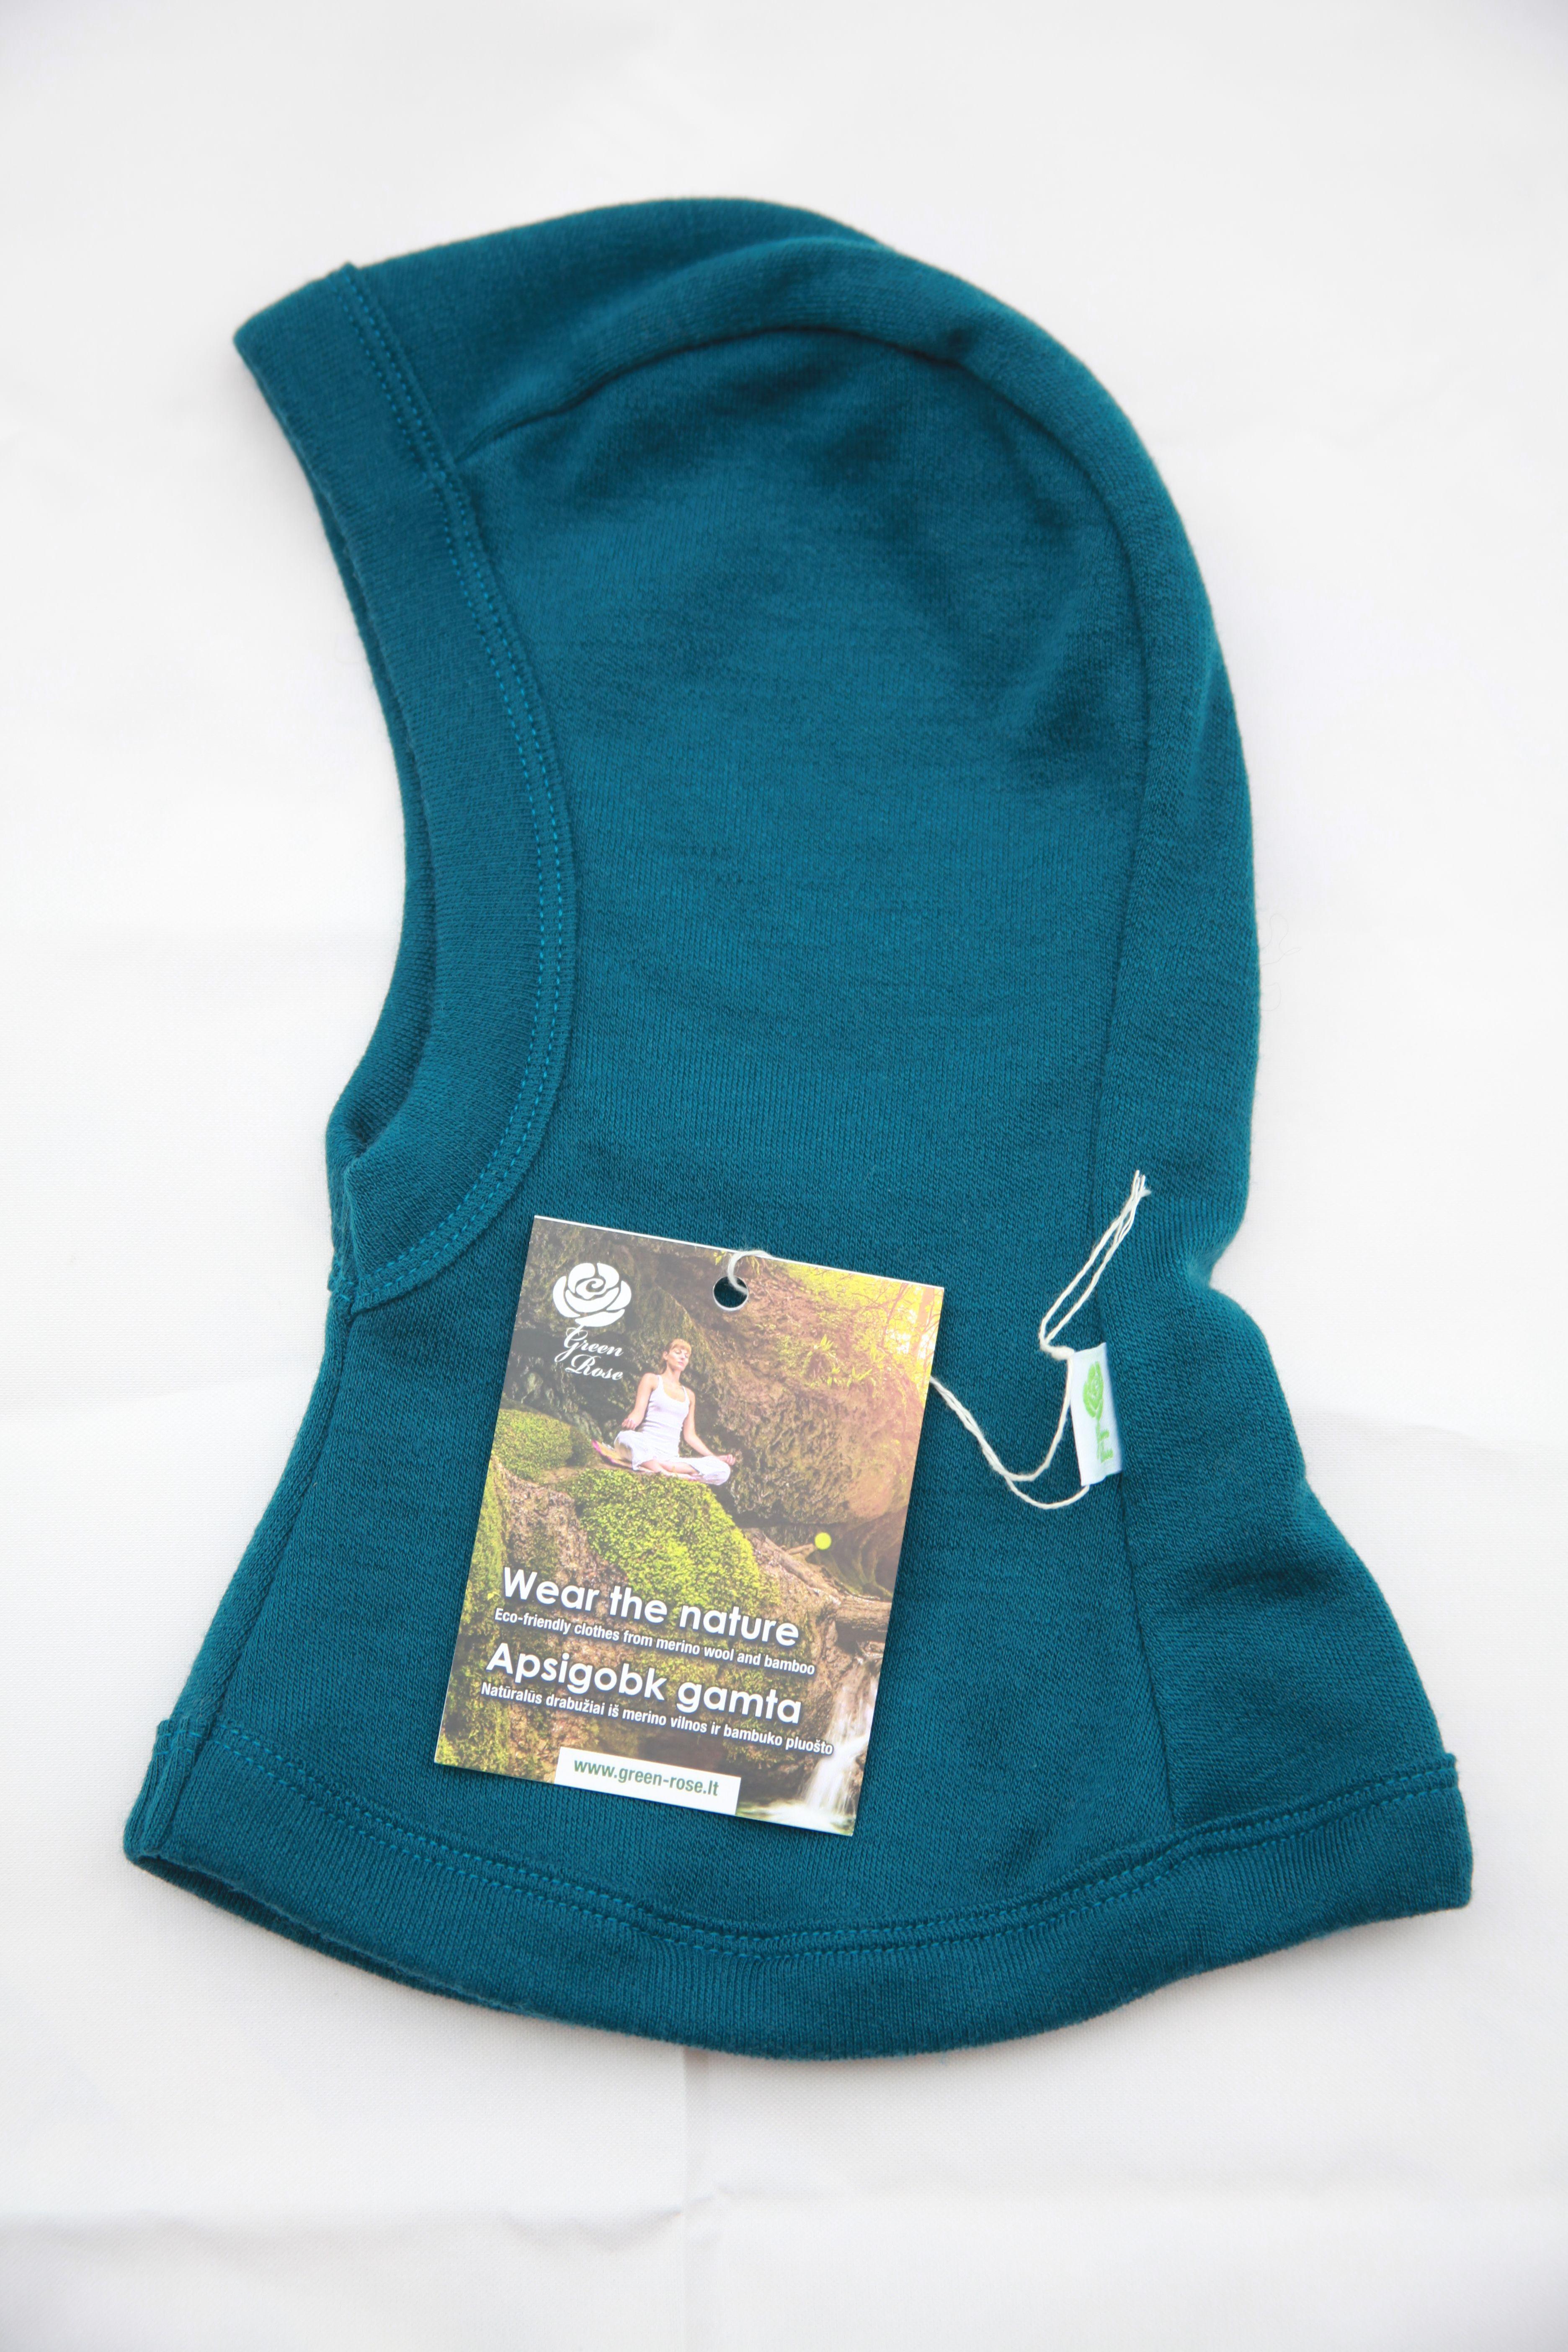 38 cm GREEN ROSE Baby Balaclavas for Girl Boy Unisex Winter Hat with Neck Warmer 100/% Merino Wool 0-6 Months, White 1